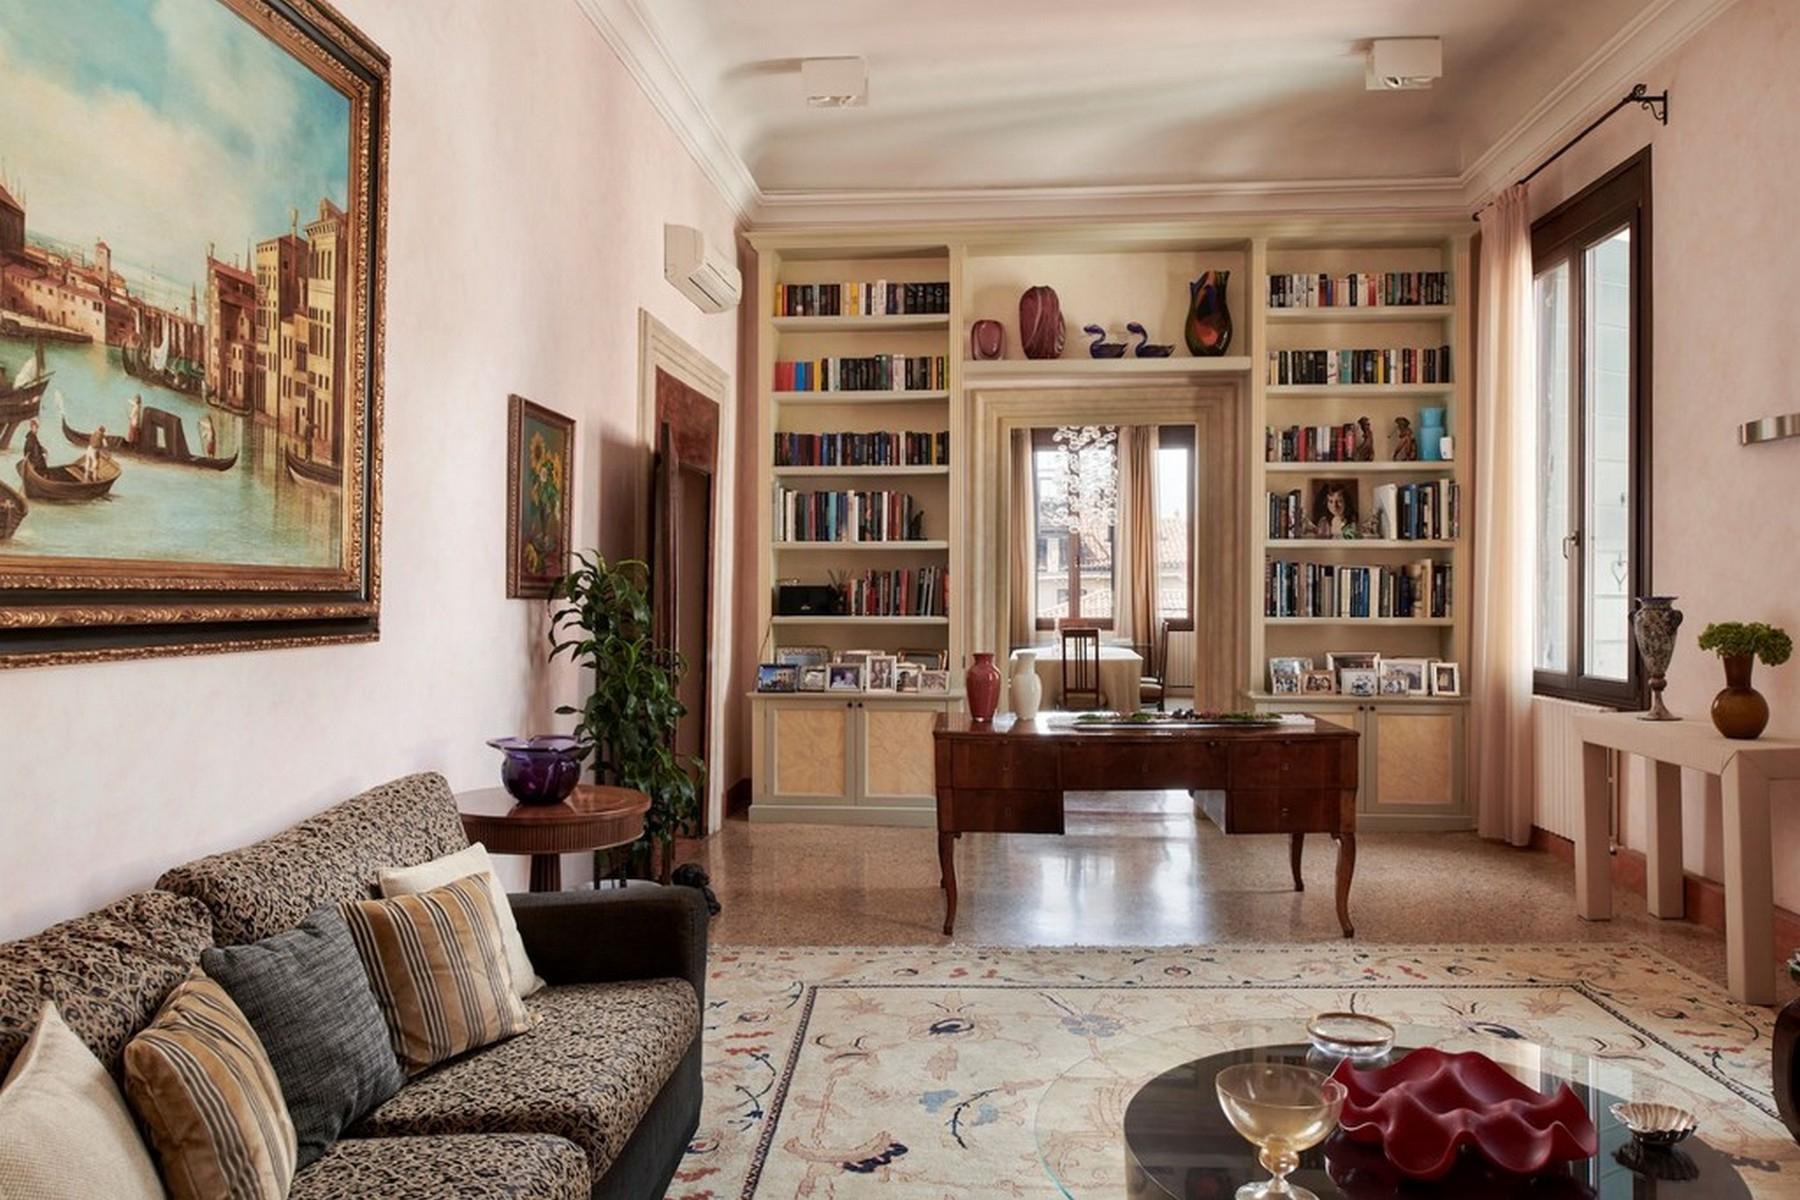 Elegante secondo Piano Nobile in un Palazzo - 3